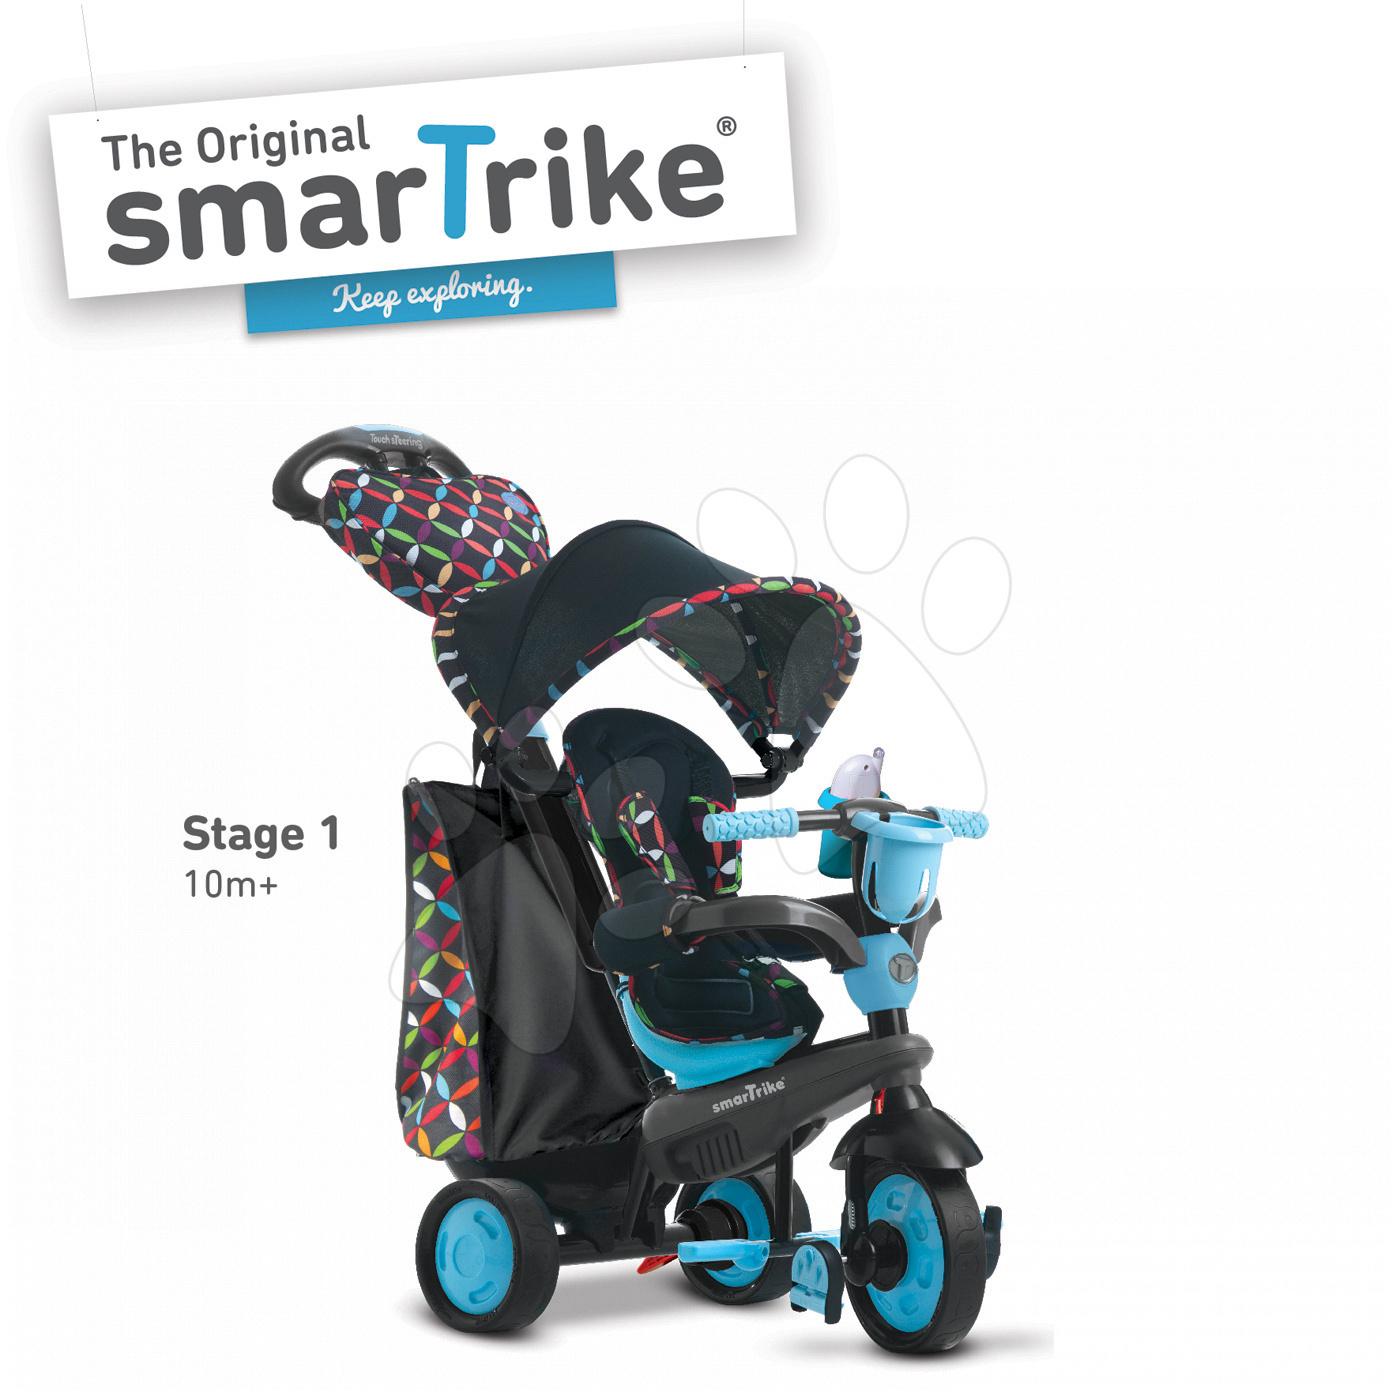 Trojkolka Boutique Blue Touch Steering 4v1 smarTrike s tlmičom modro-čierna od 10 mes